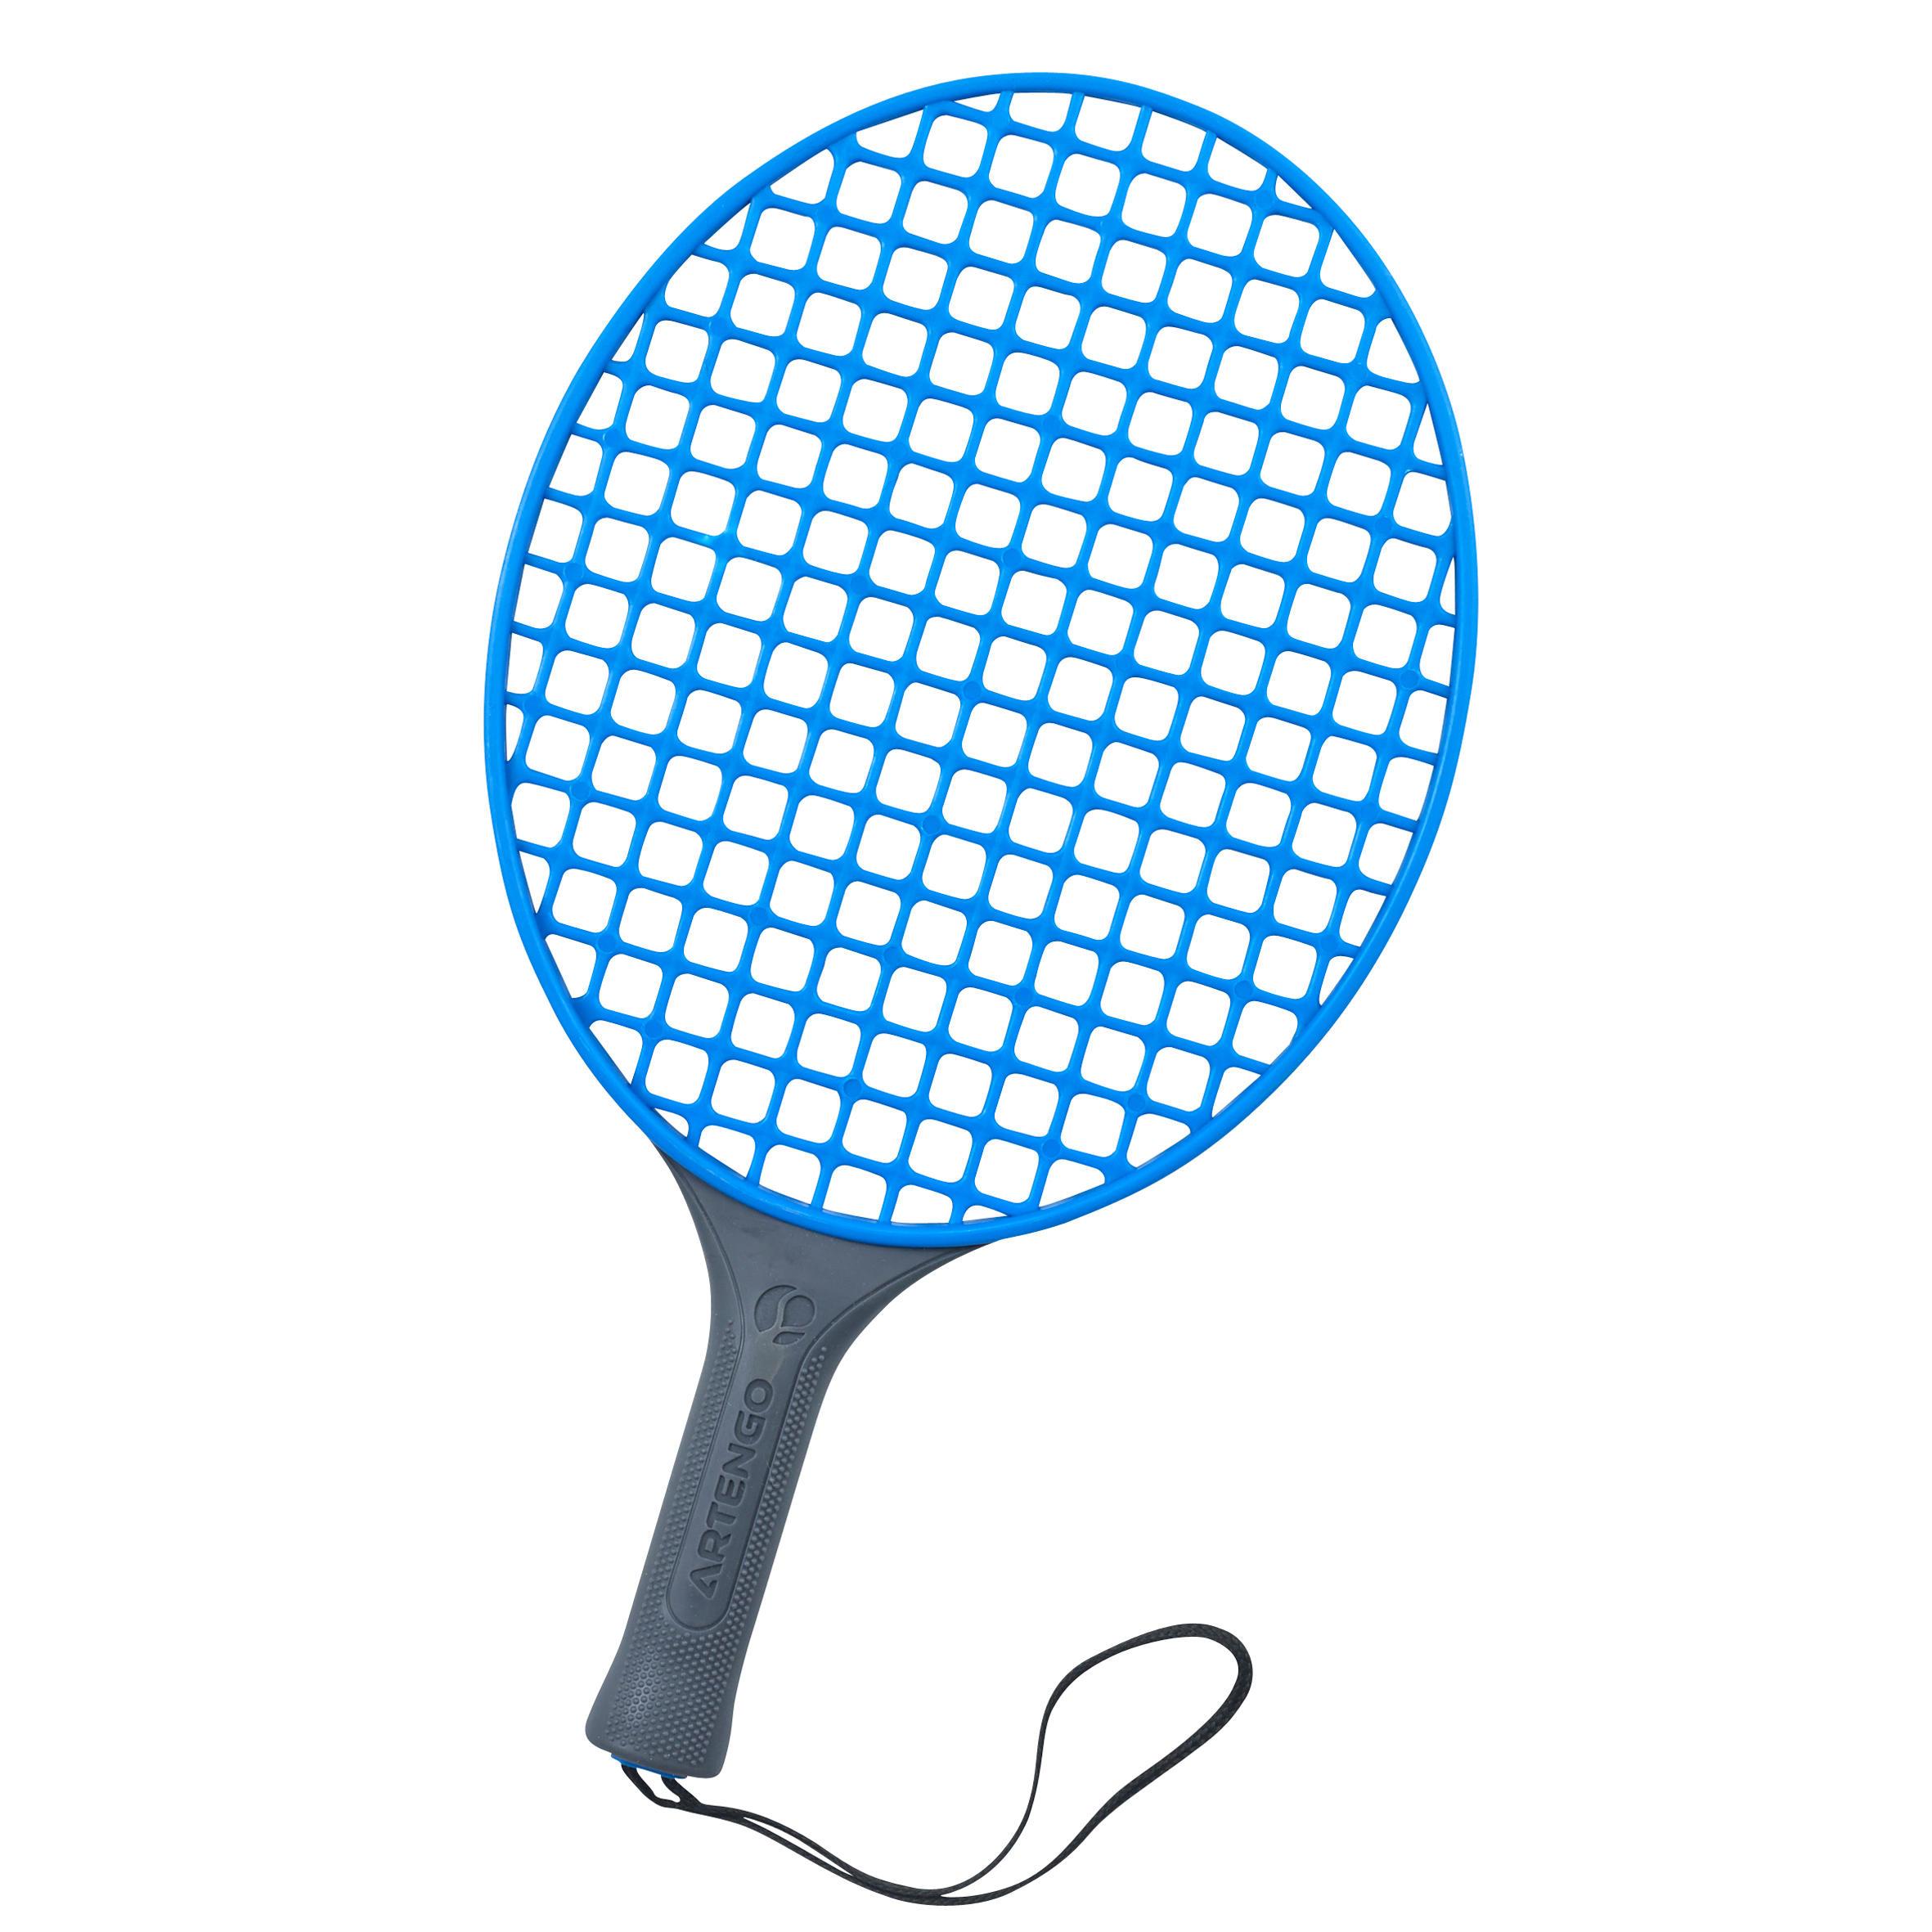 Raqueta de speedball TURNBALL RACKET azul